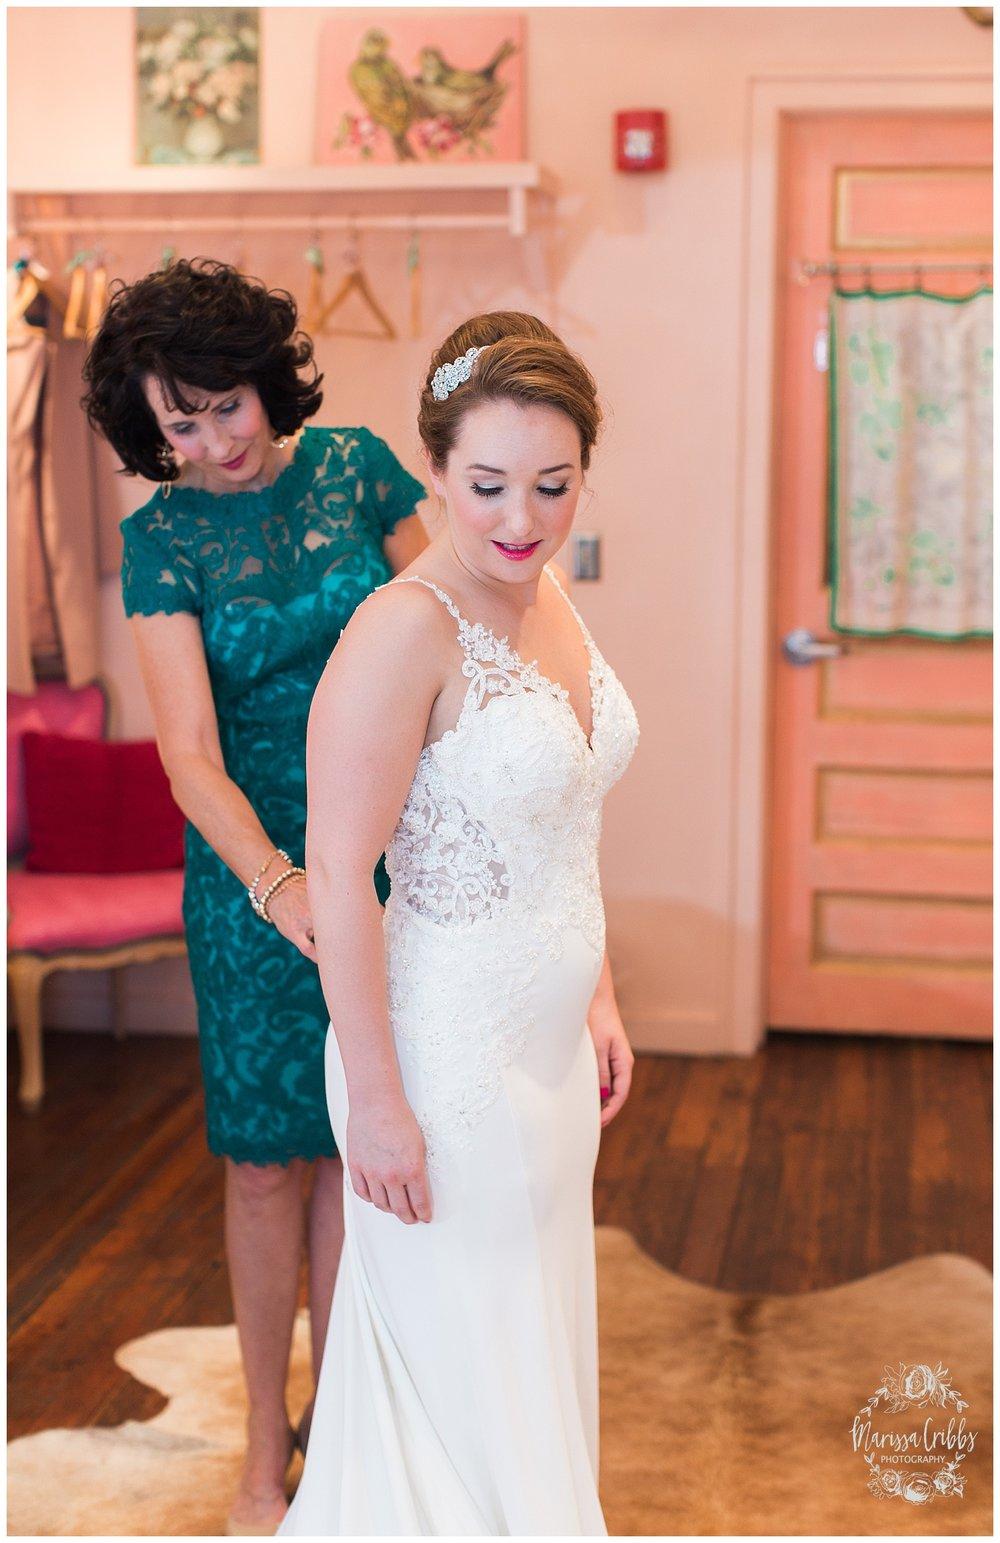 Bride & The Bauer Wedding | Hannah & Jeff | KC Wedding Photographers | Rainy Wedding Photos KC | Marissa Cribbs Photography_1011.jpg